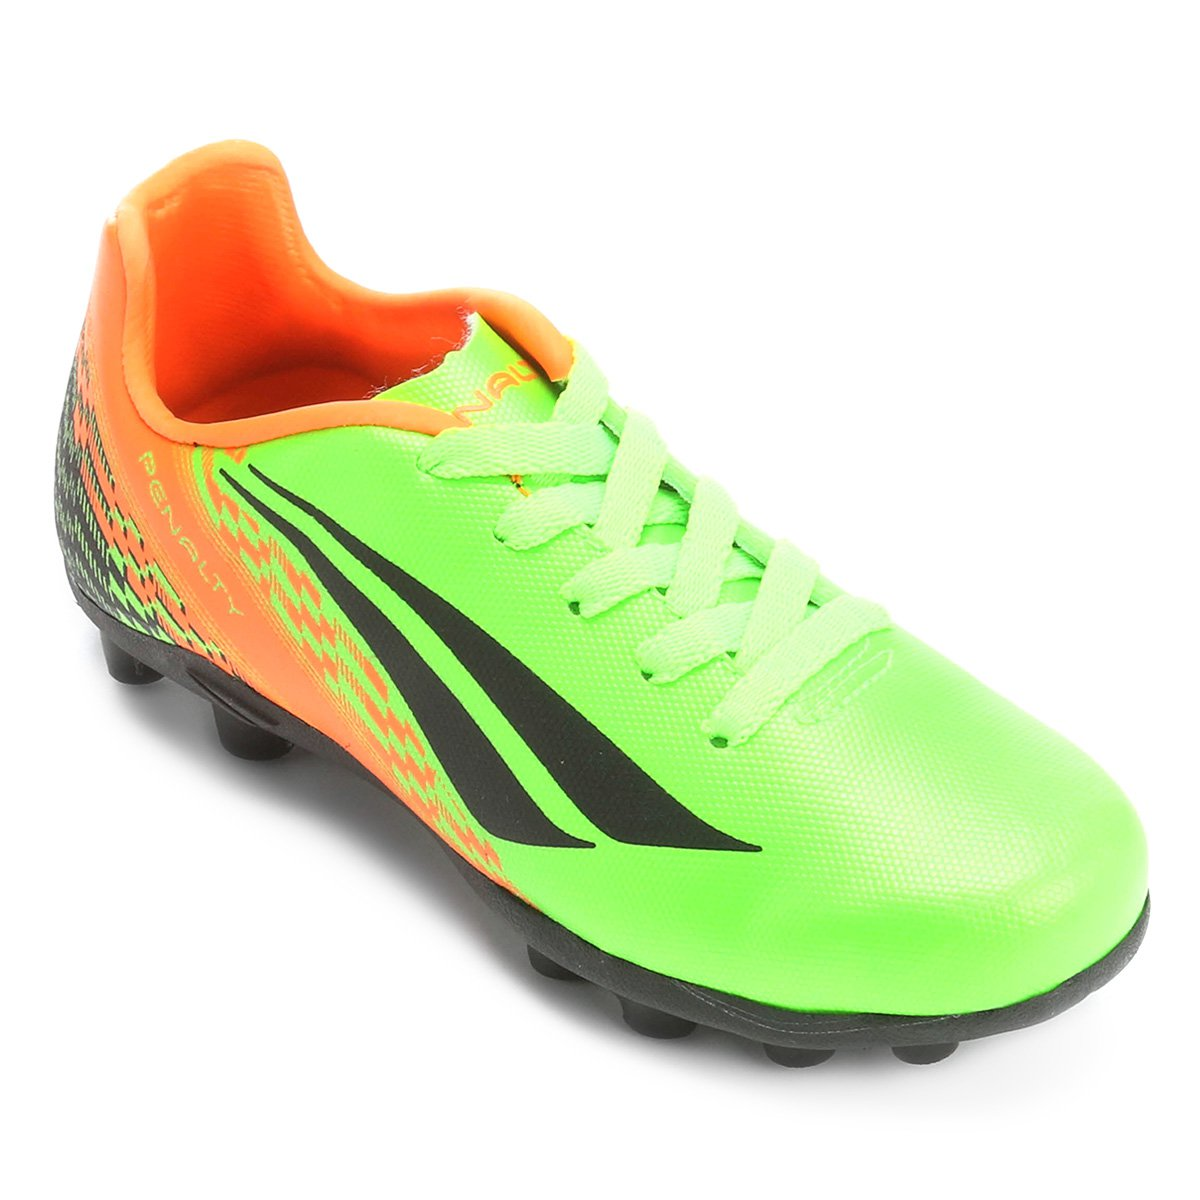 9970ccf932 Chuteira Campo Infantil Penalty K Soccer Storm 7 - Verde Claro e Laranja